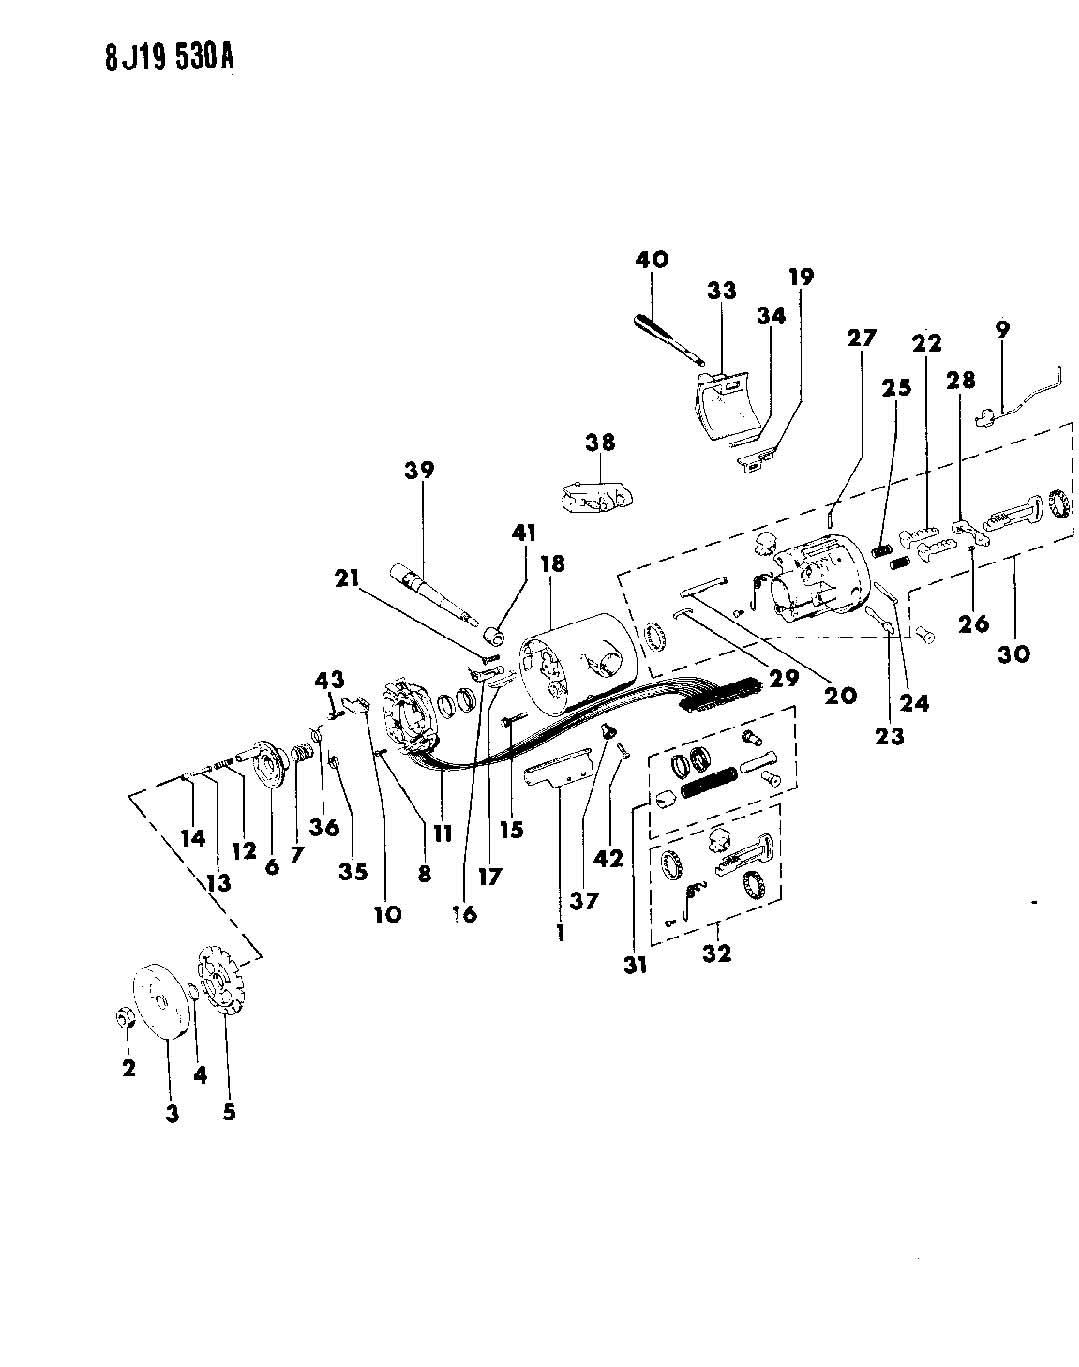 steering column diagram as well 1989 ford ranger wiring diagram